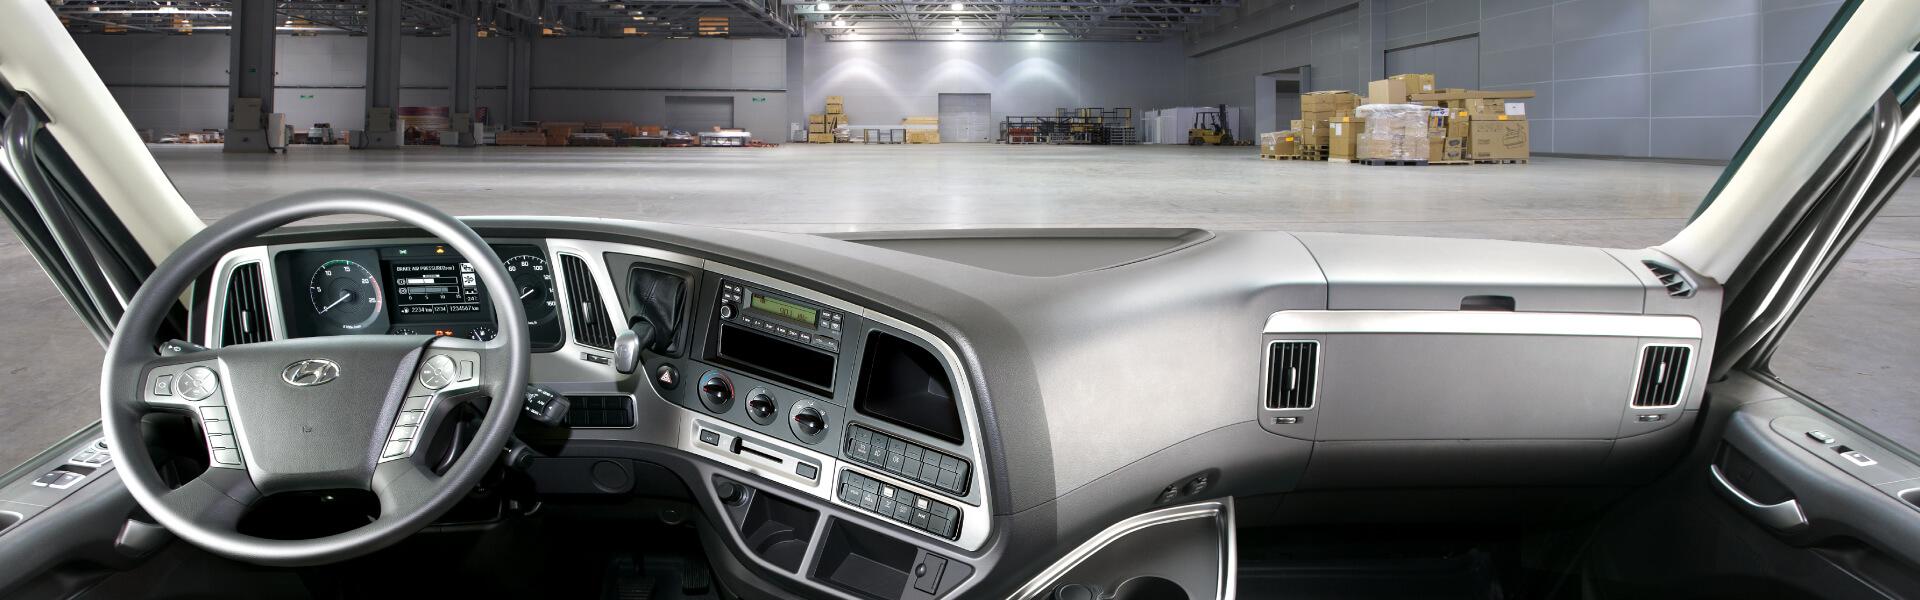 xcient-header-interior